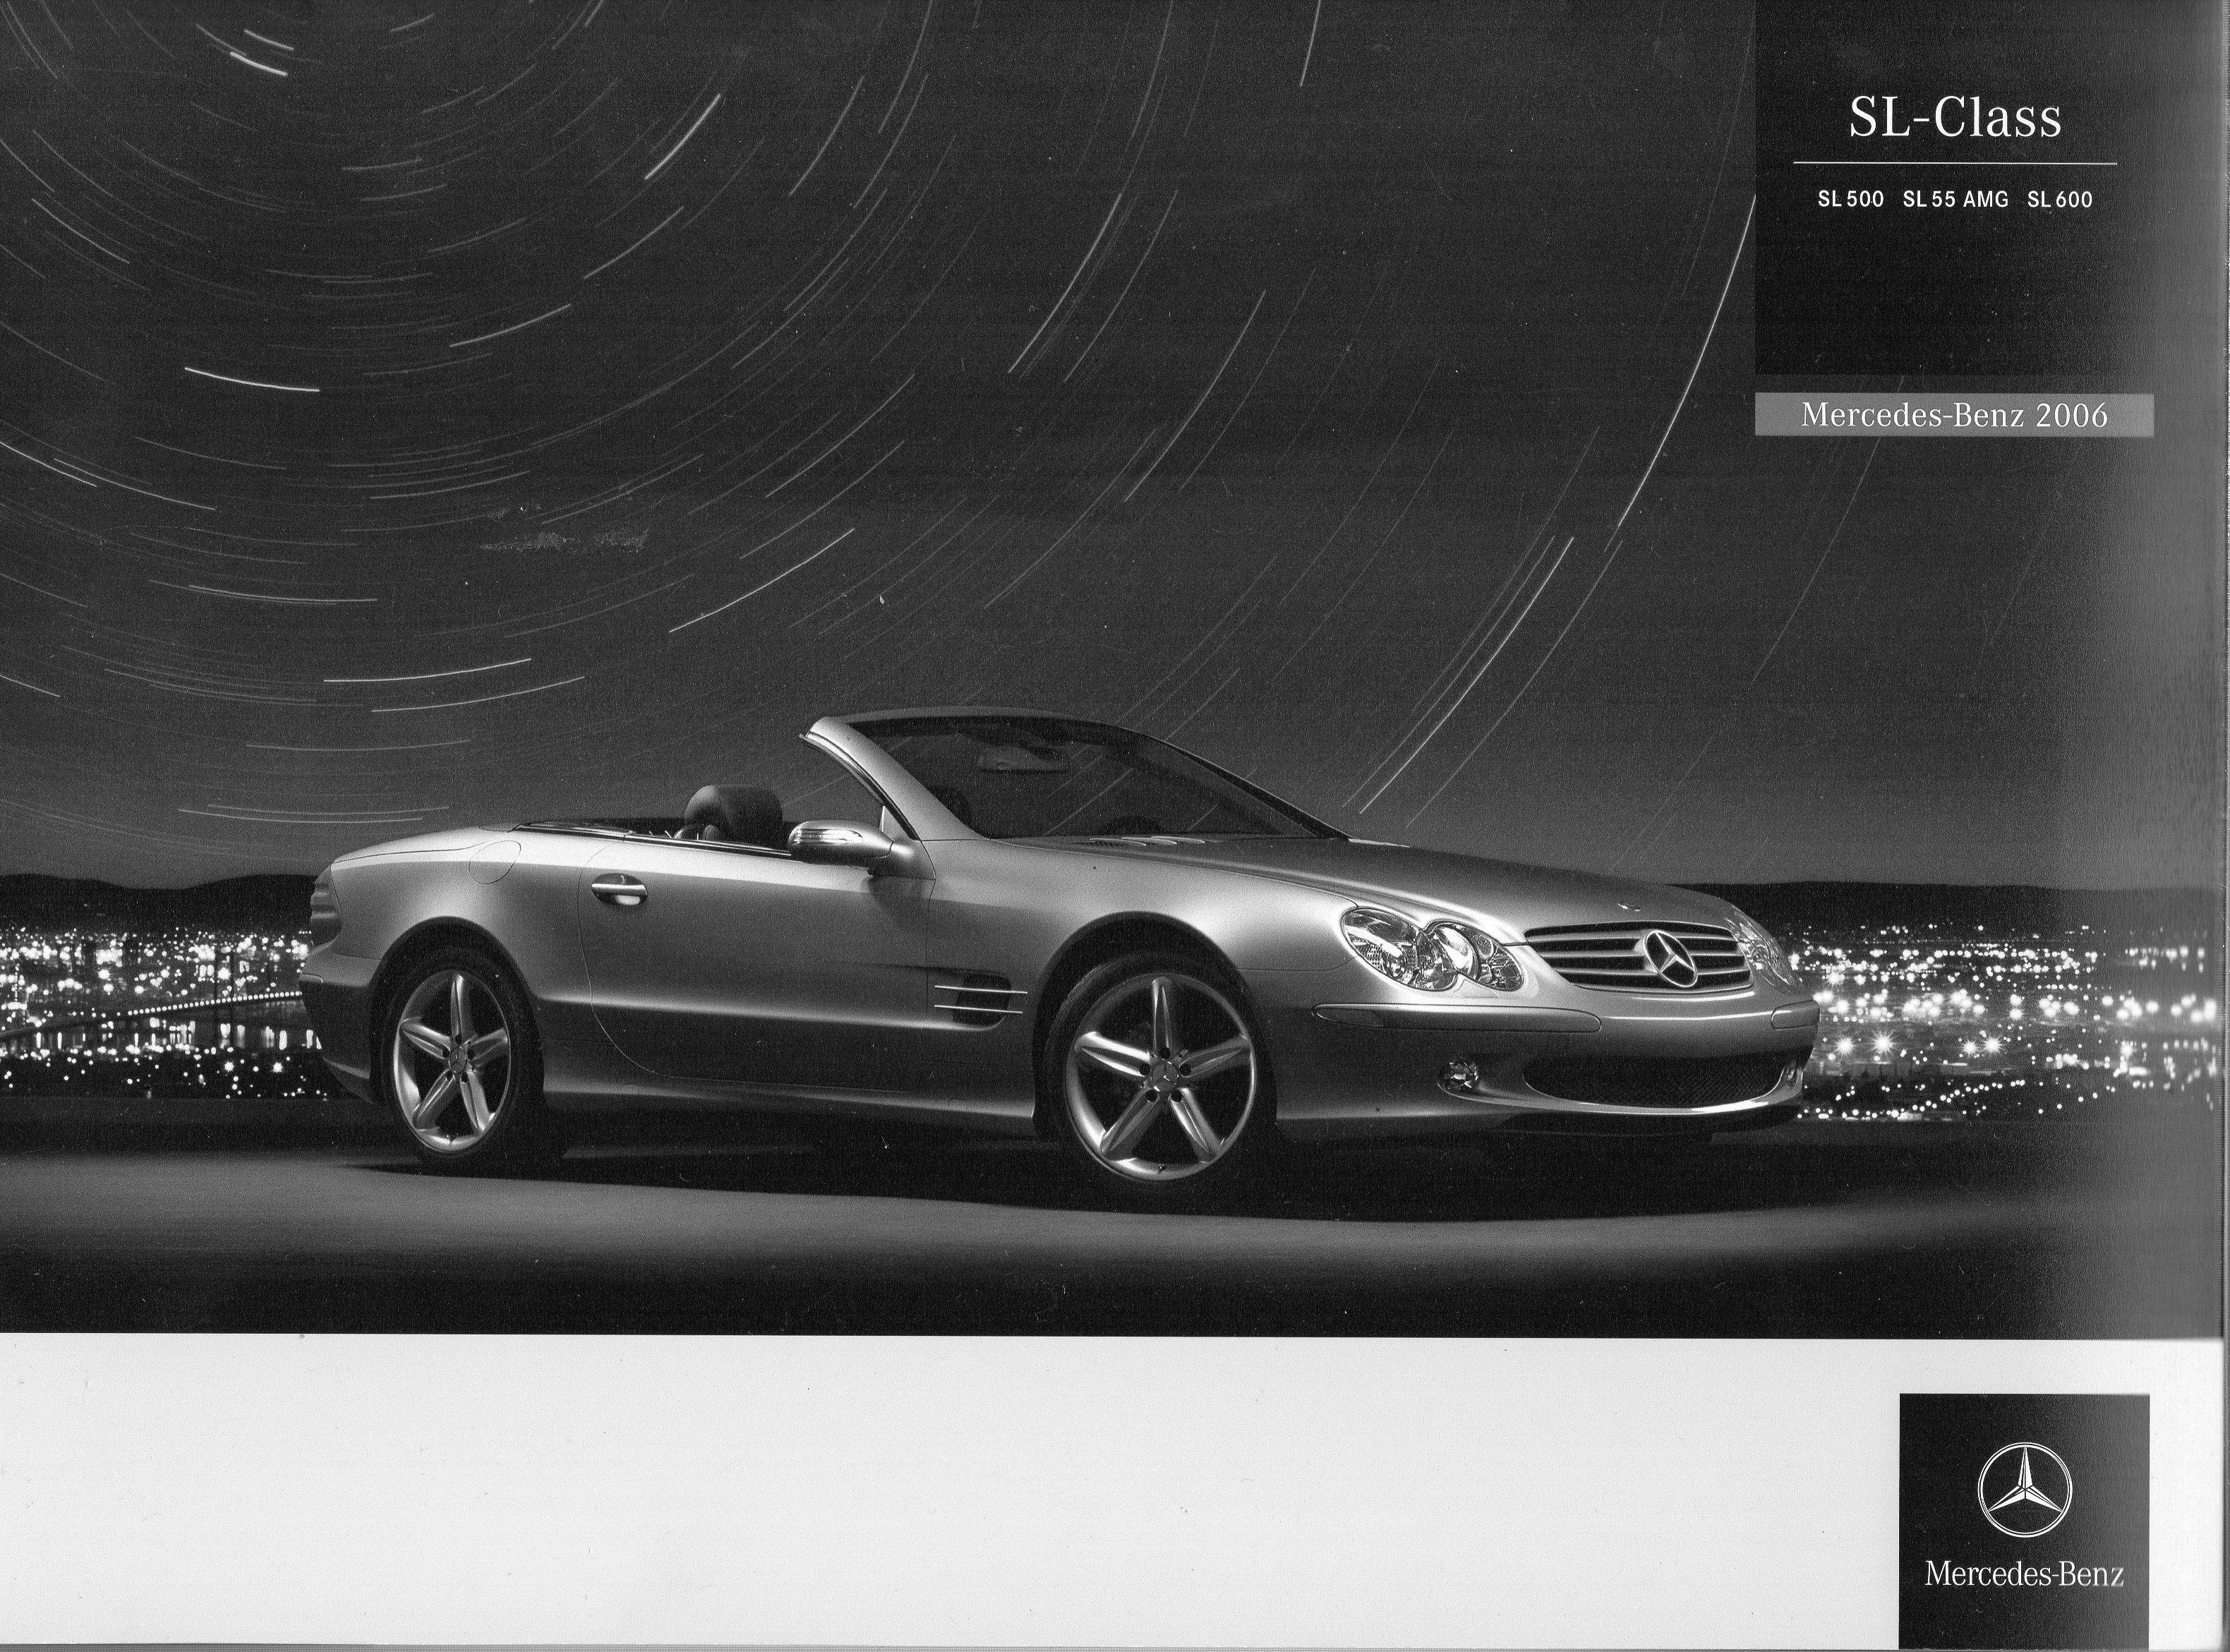 2006 mb sl class brochure mercedes benz 2005 2007 for Mercedes benz e class brochure